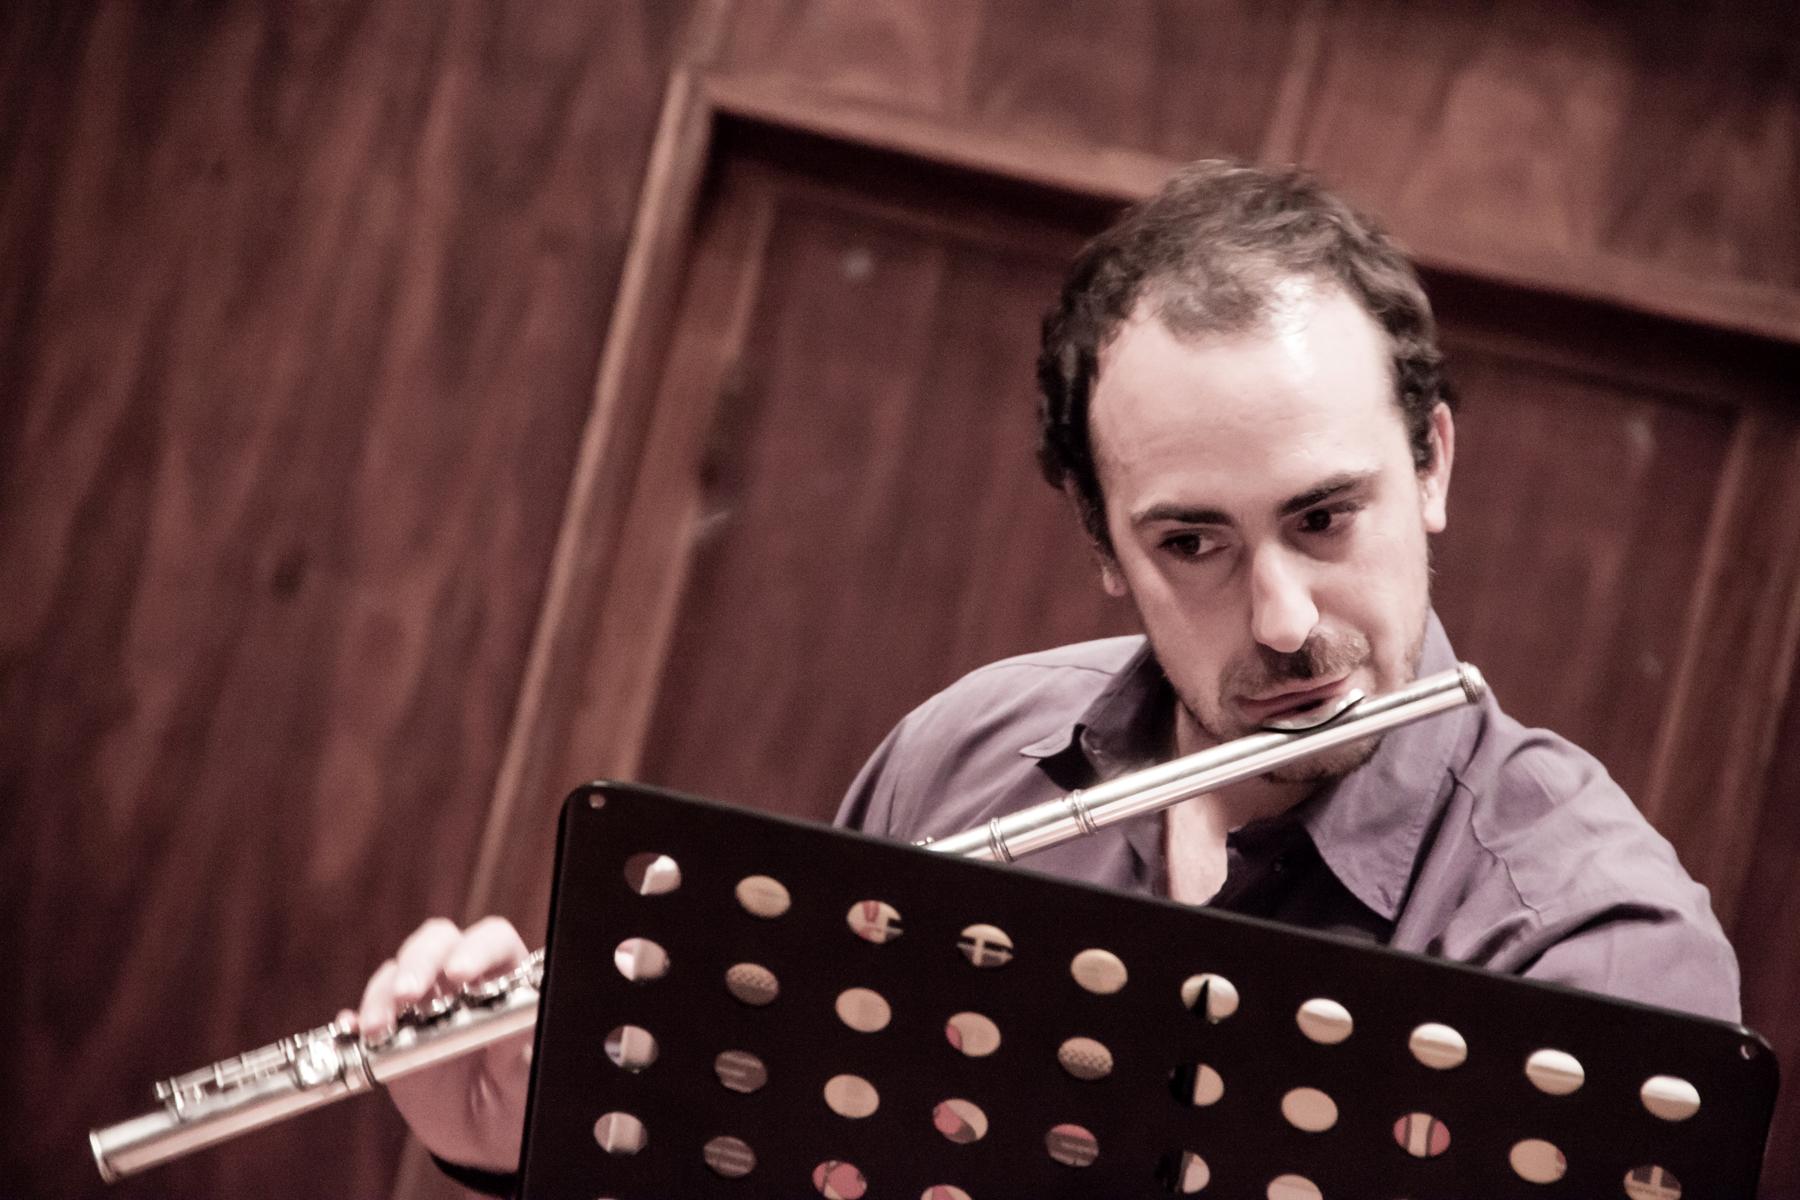 Master's degree flute recital open to the public